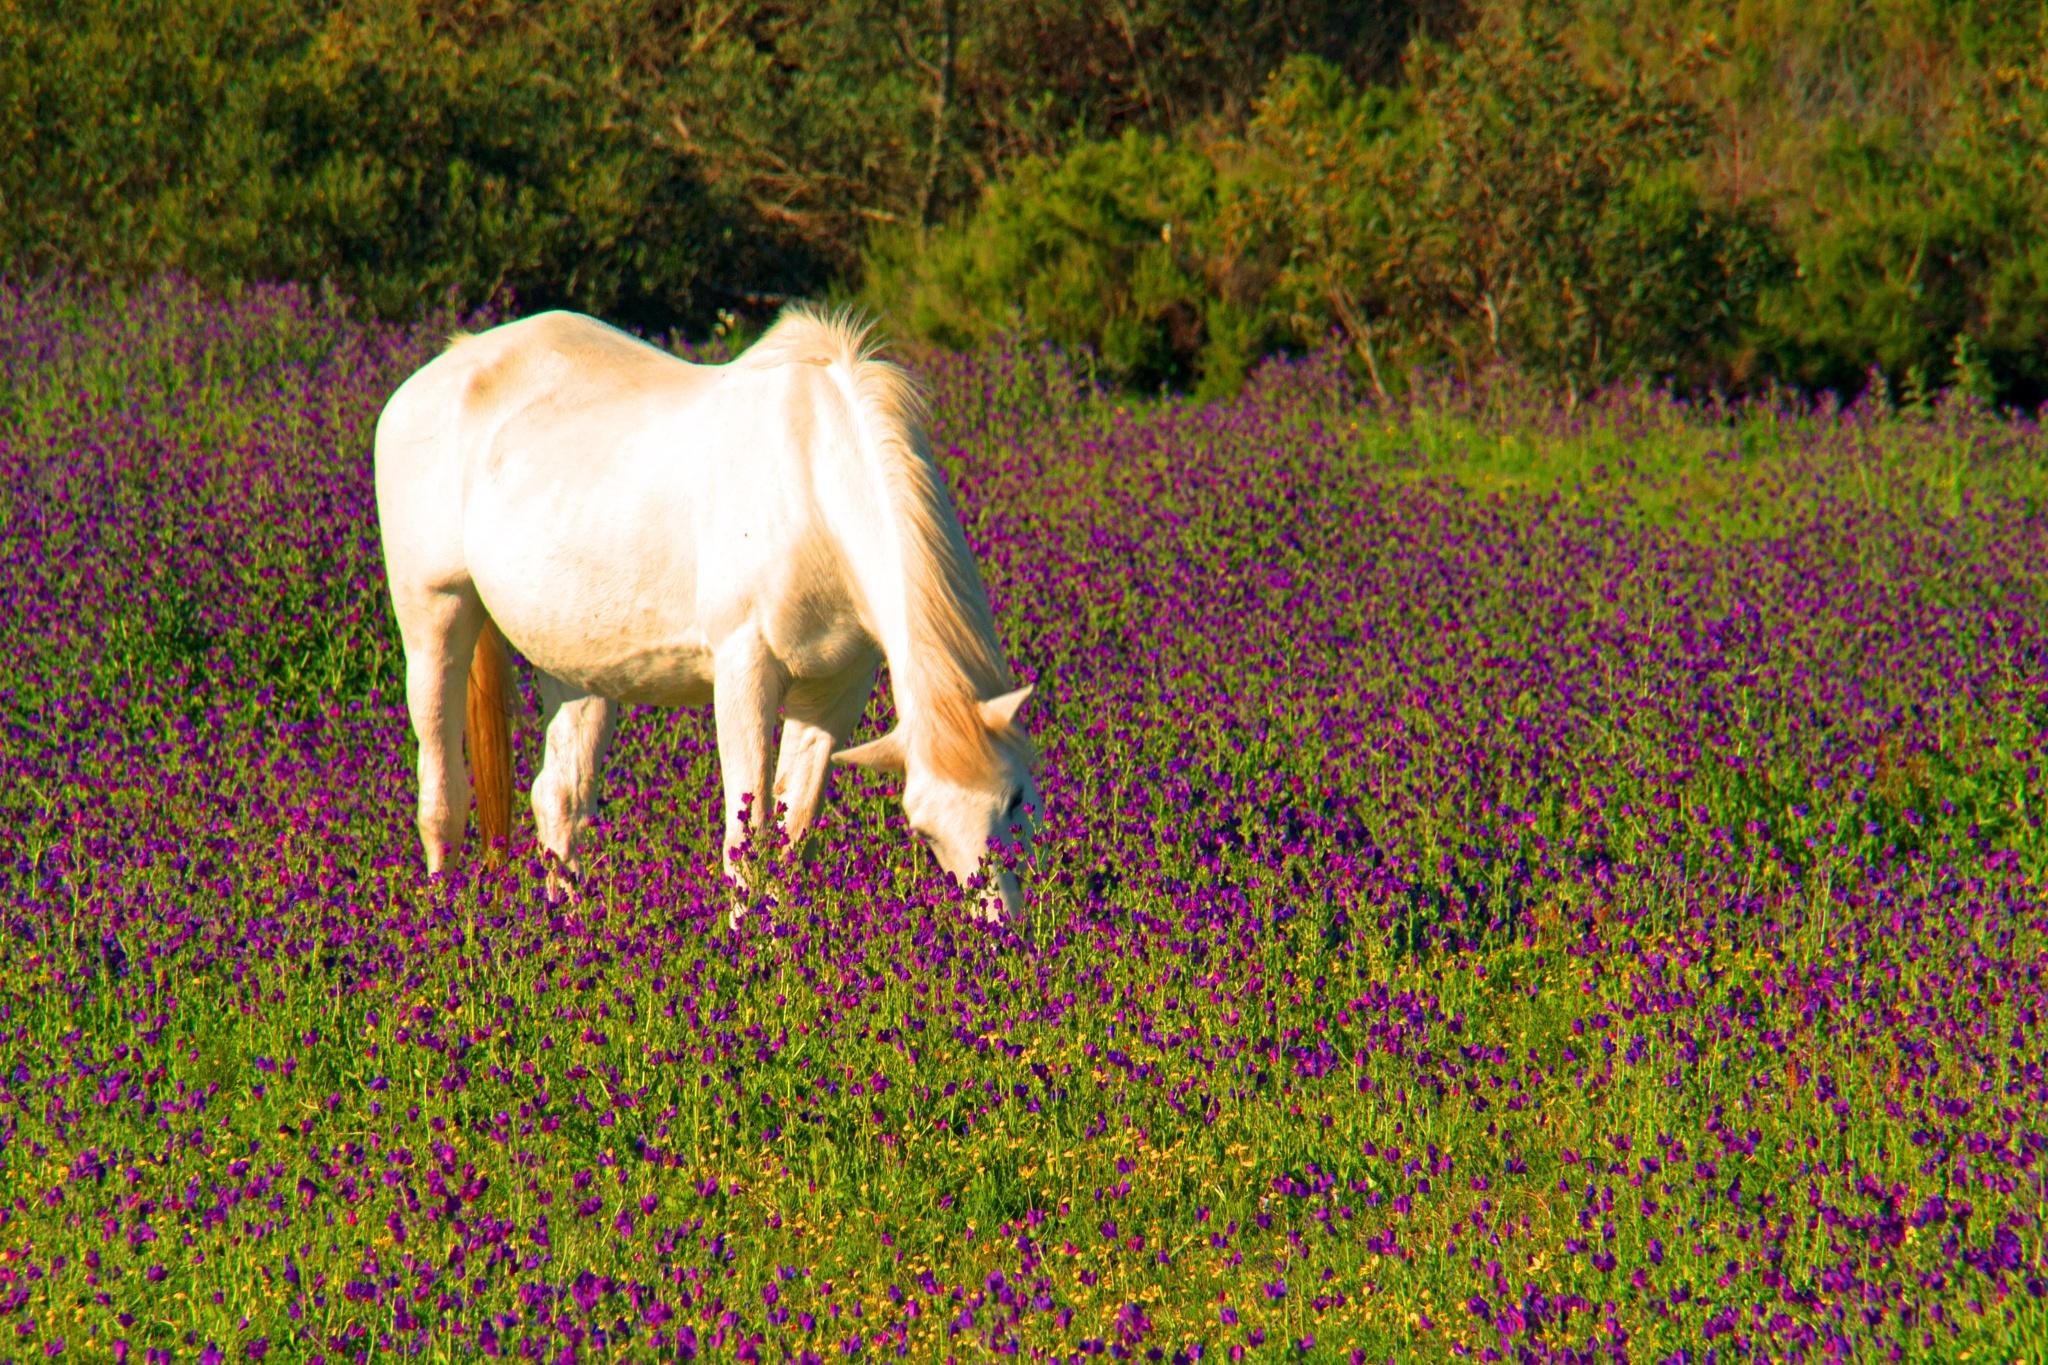 Horse amongst flowers by Nauta Piscatorque